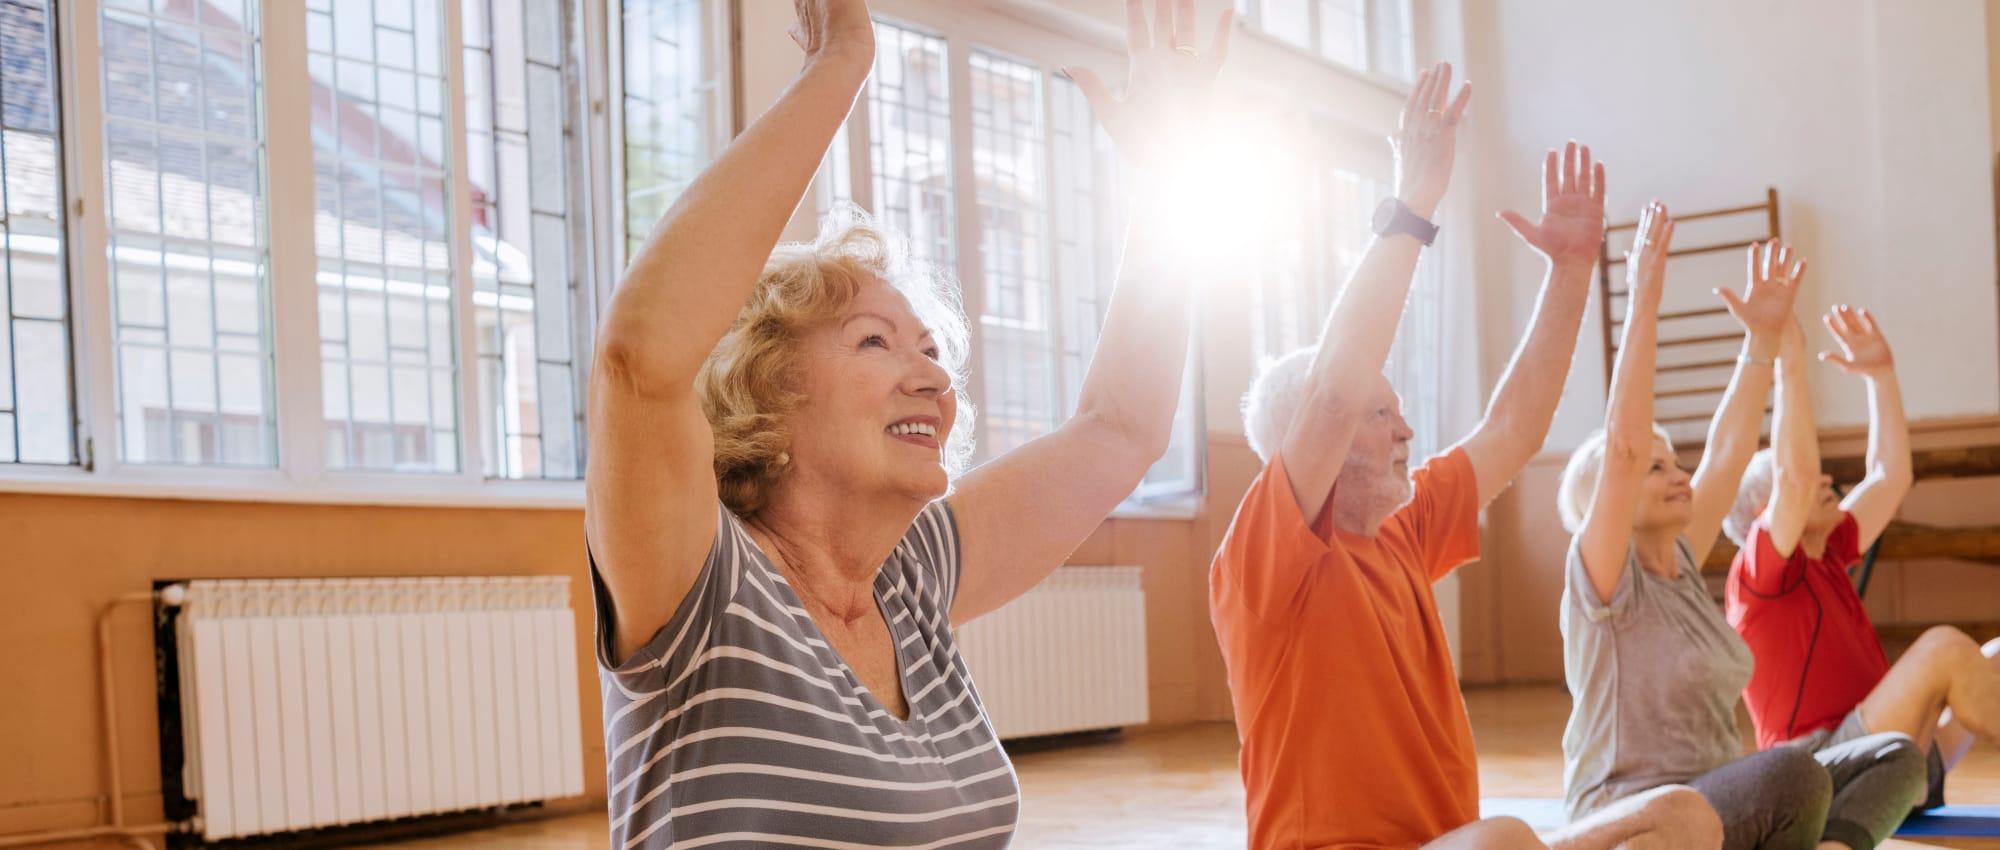 Our programs at Milestone Senior Living in Cross Plains, Wisconsin.